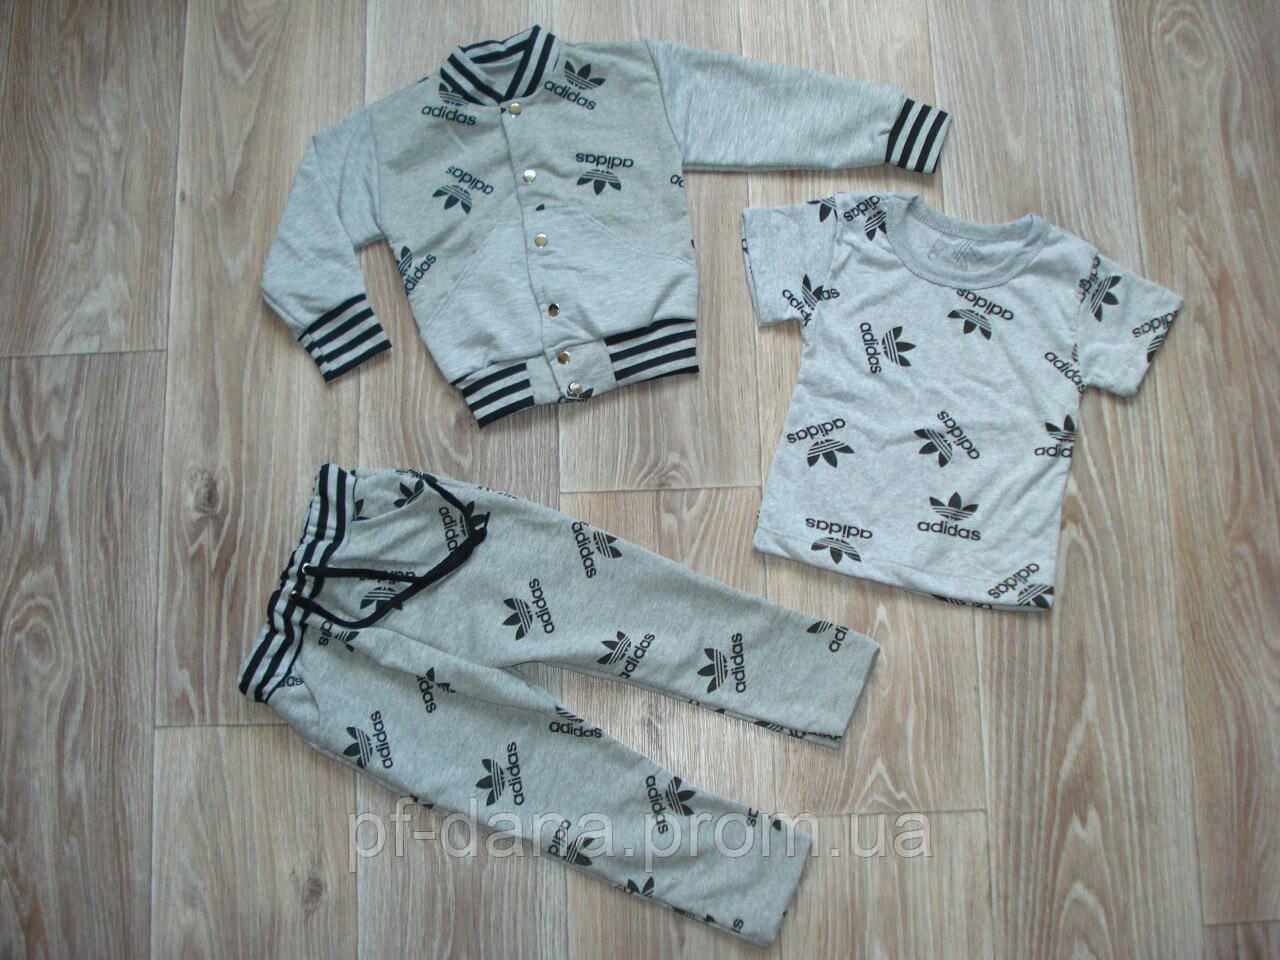 ce956e3a035a Спортивный костюм плюс футболка АДИДАС для мальчика. Серый - ПФ